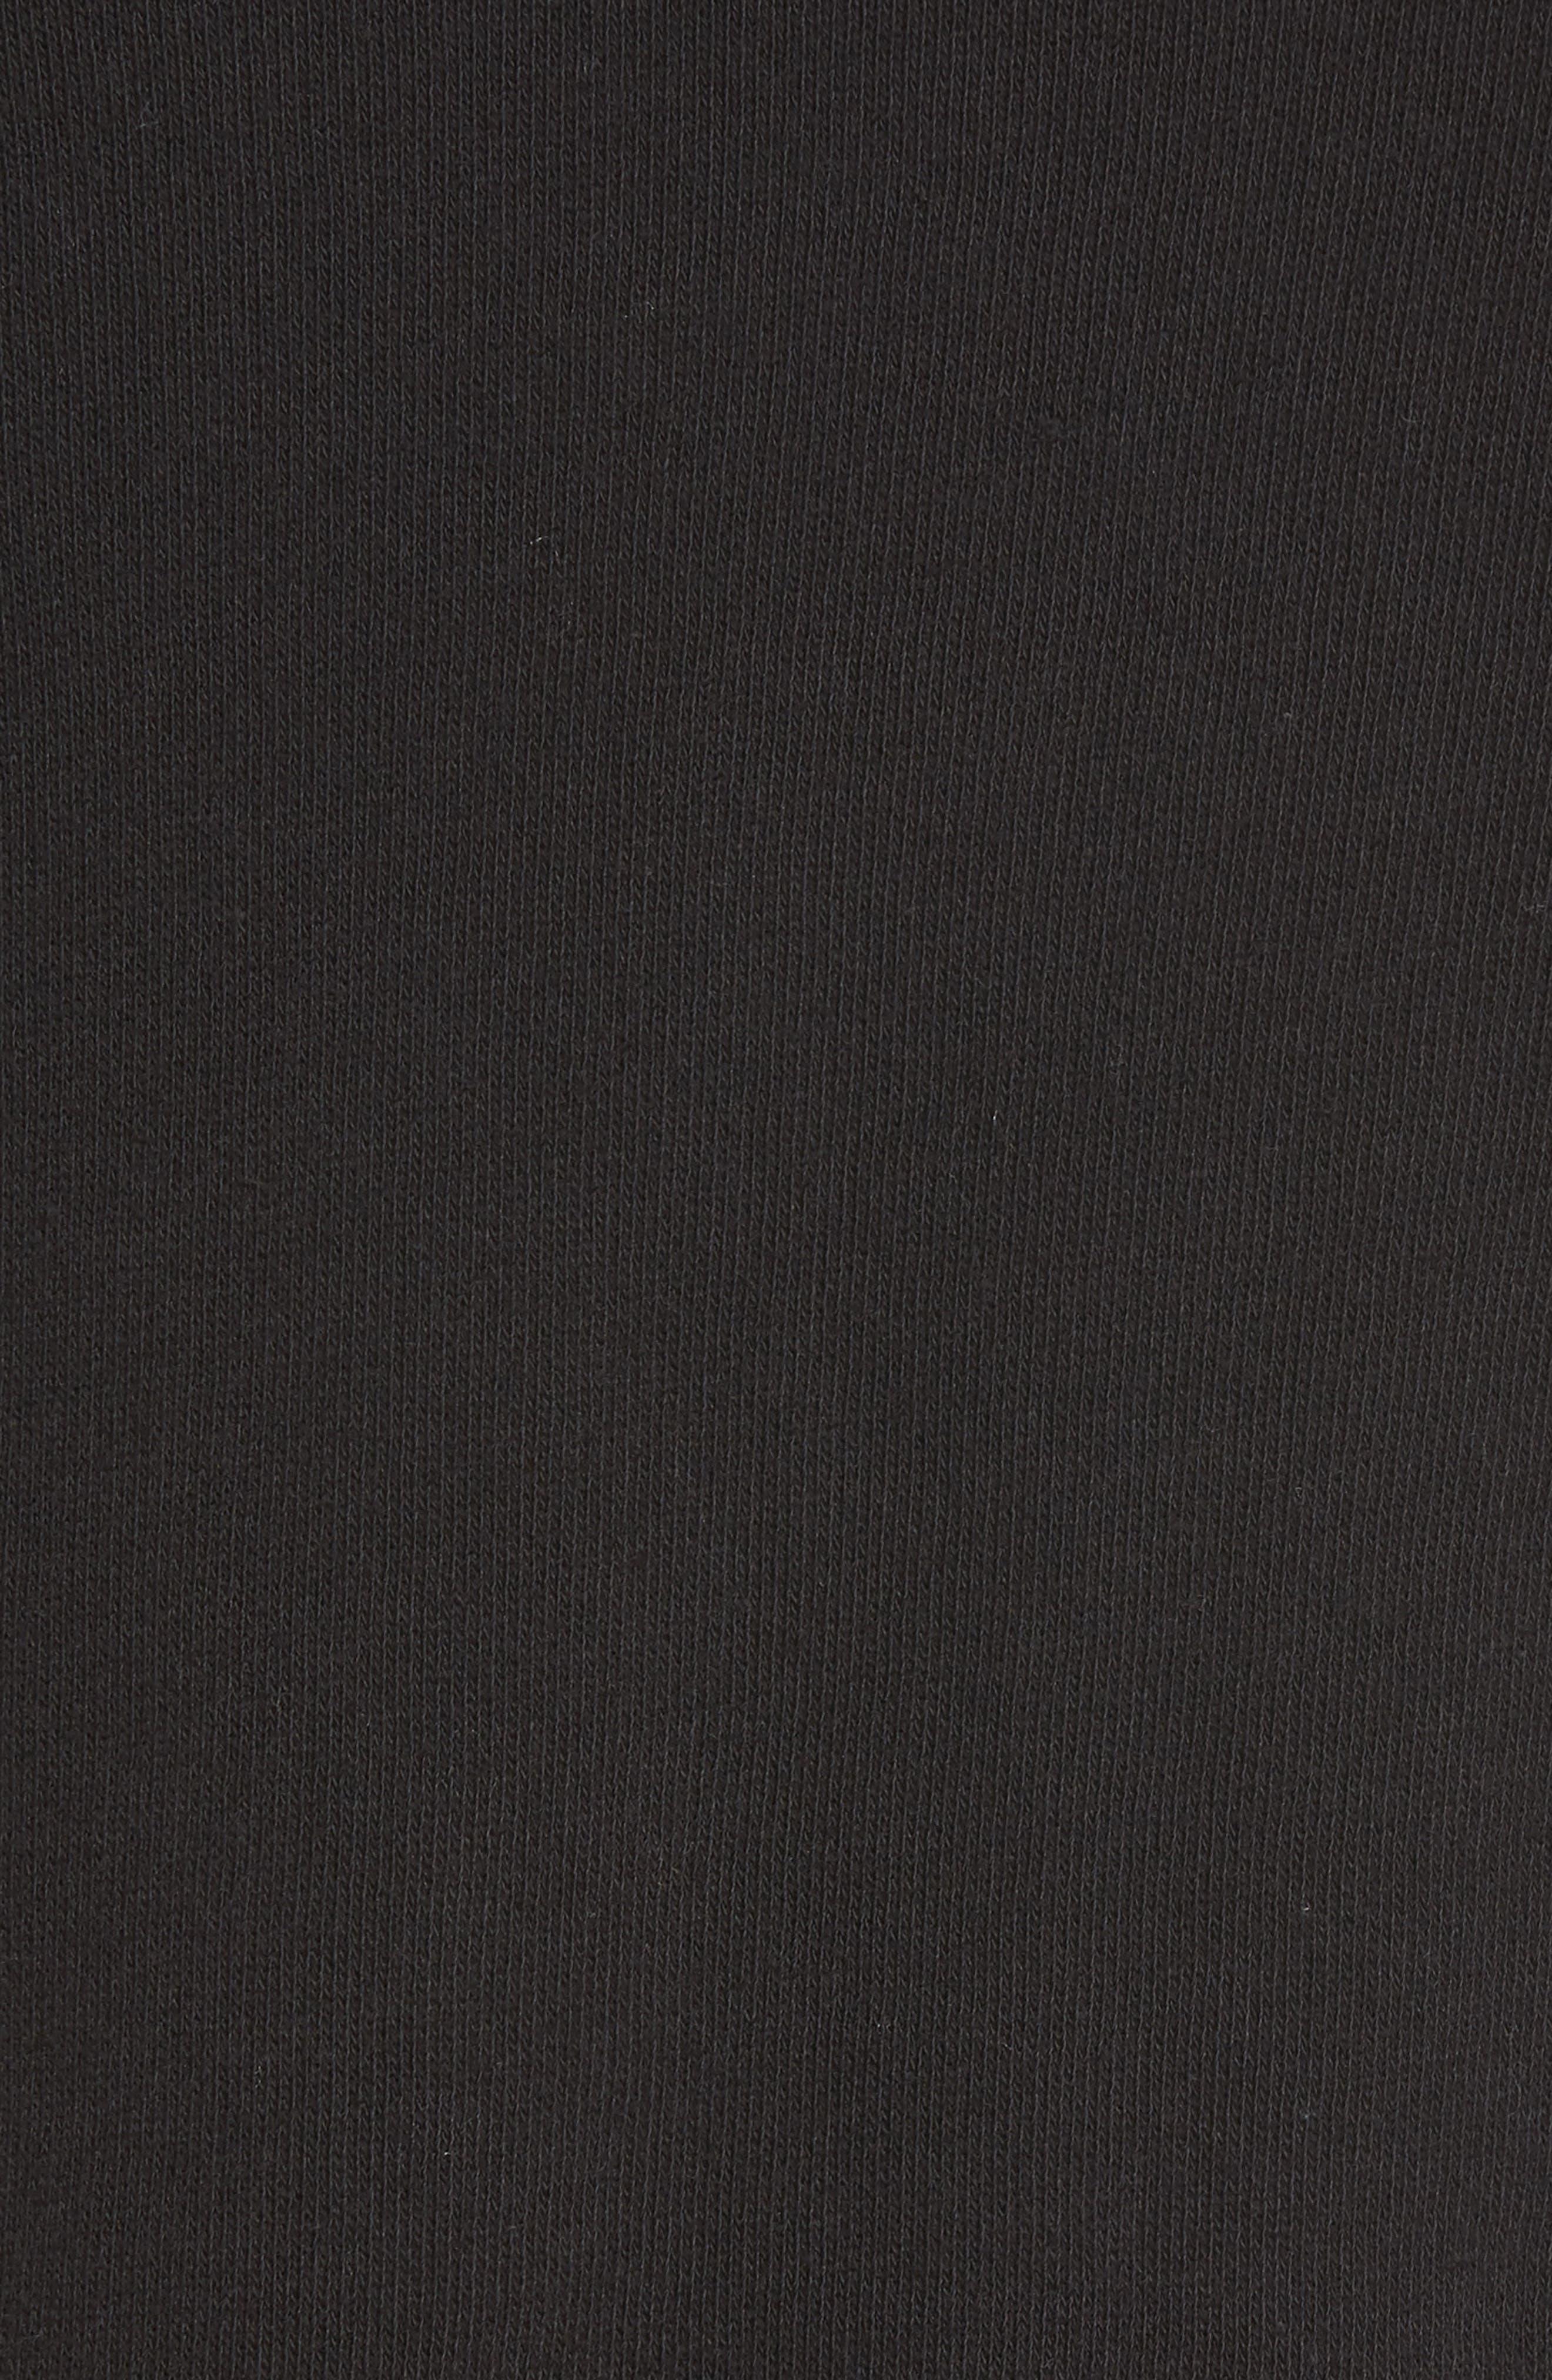 West Fourth Ruffle Sweatshirt,                             Alternate thumbnail 5, color,                             001